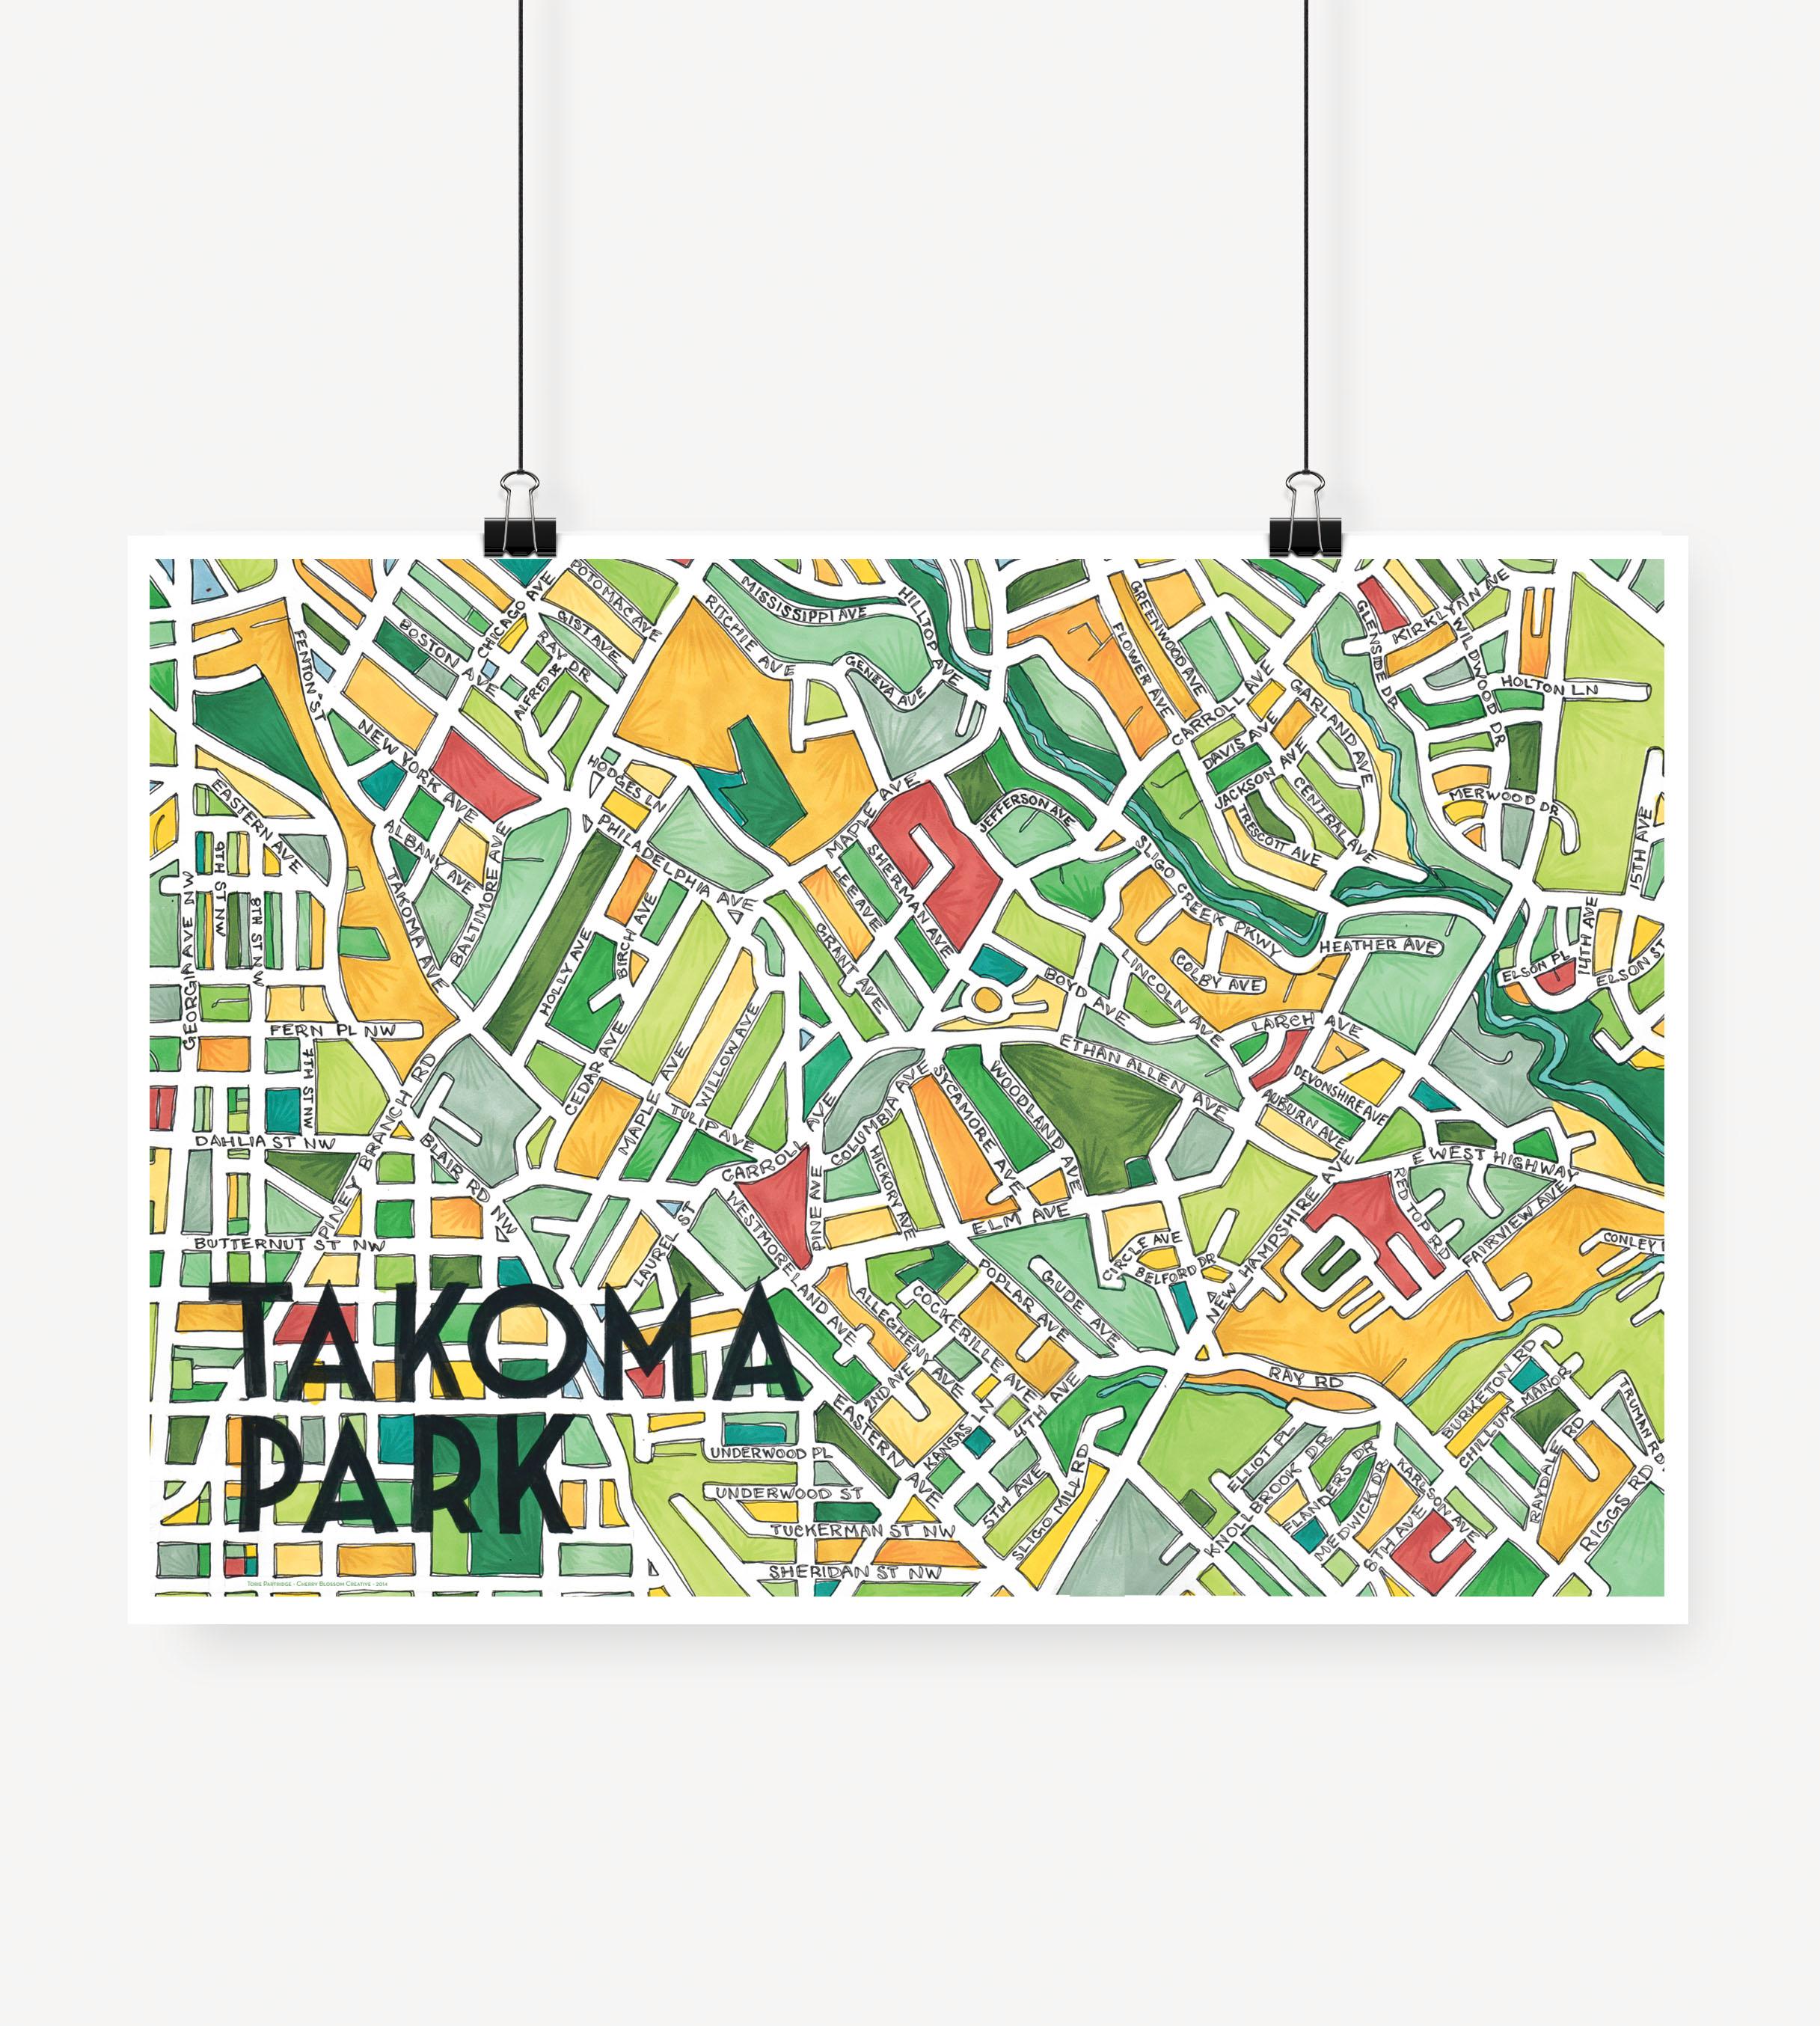 Cherry Blossom Creative — Takoma Park Print on